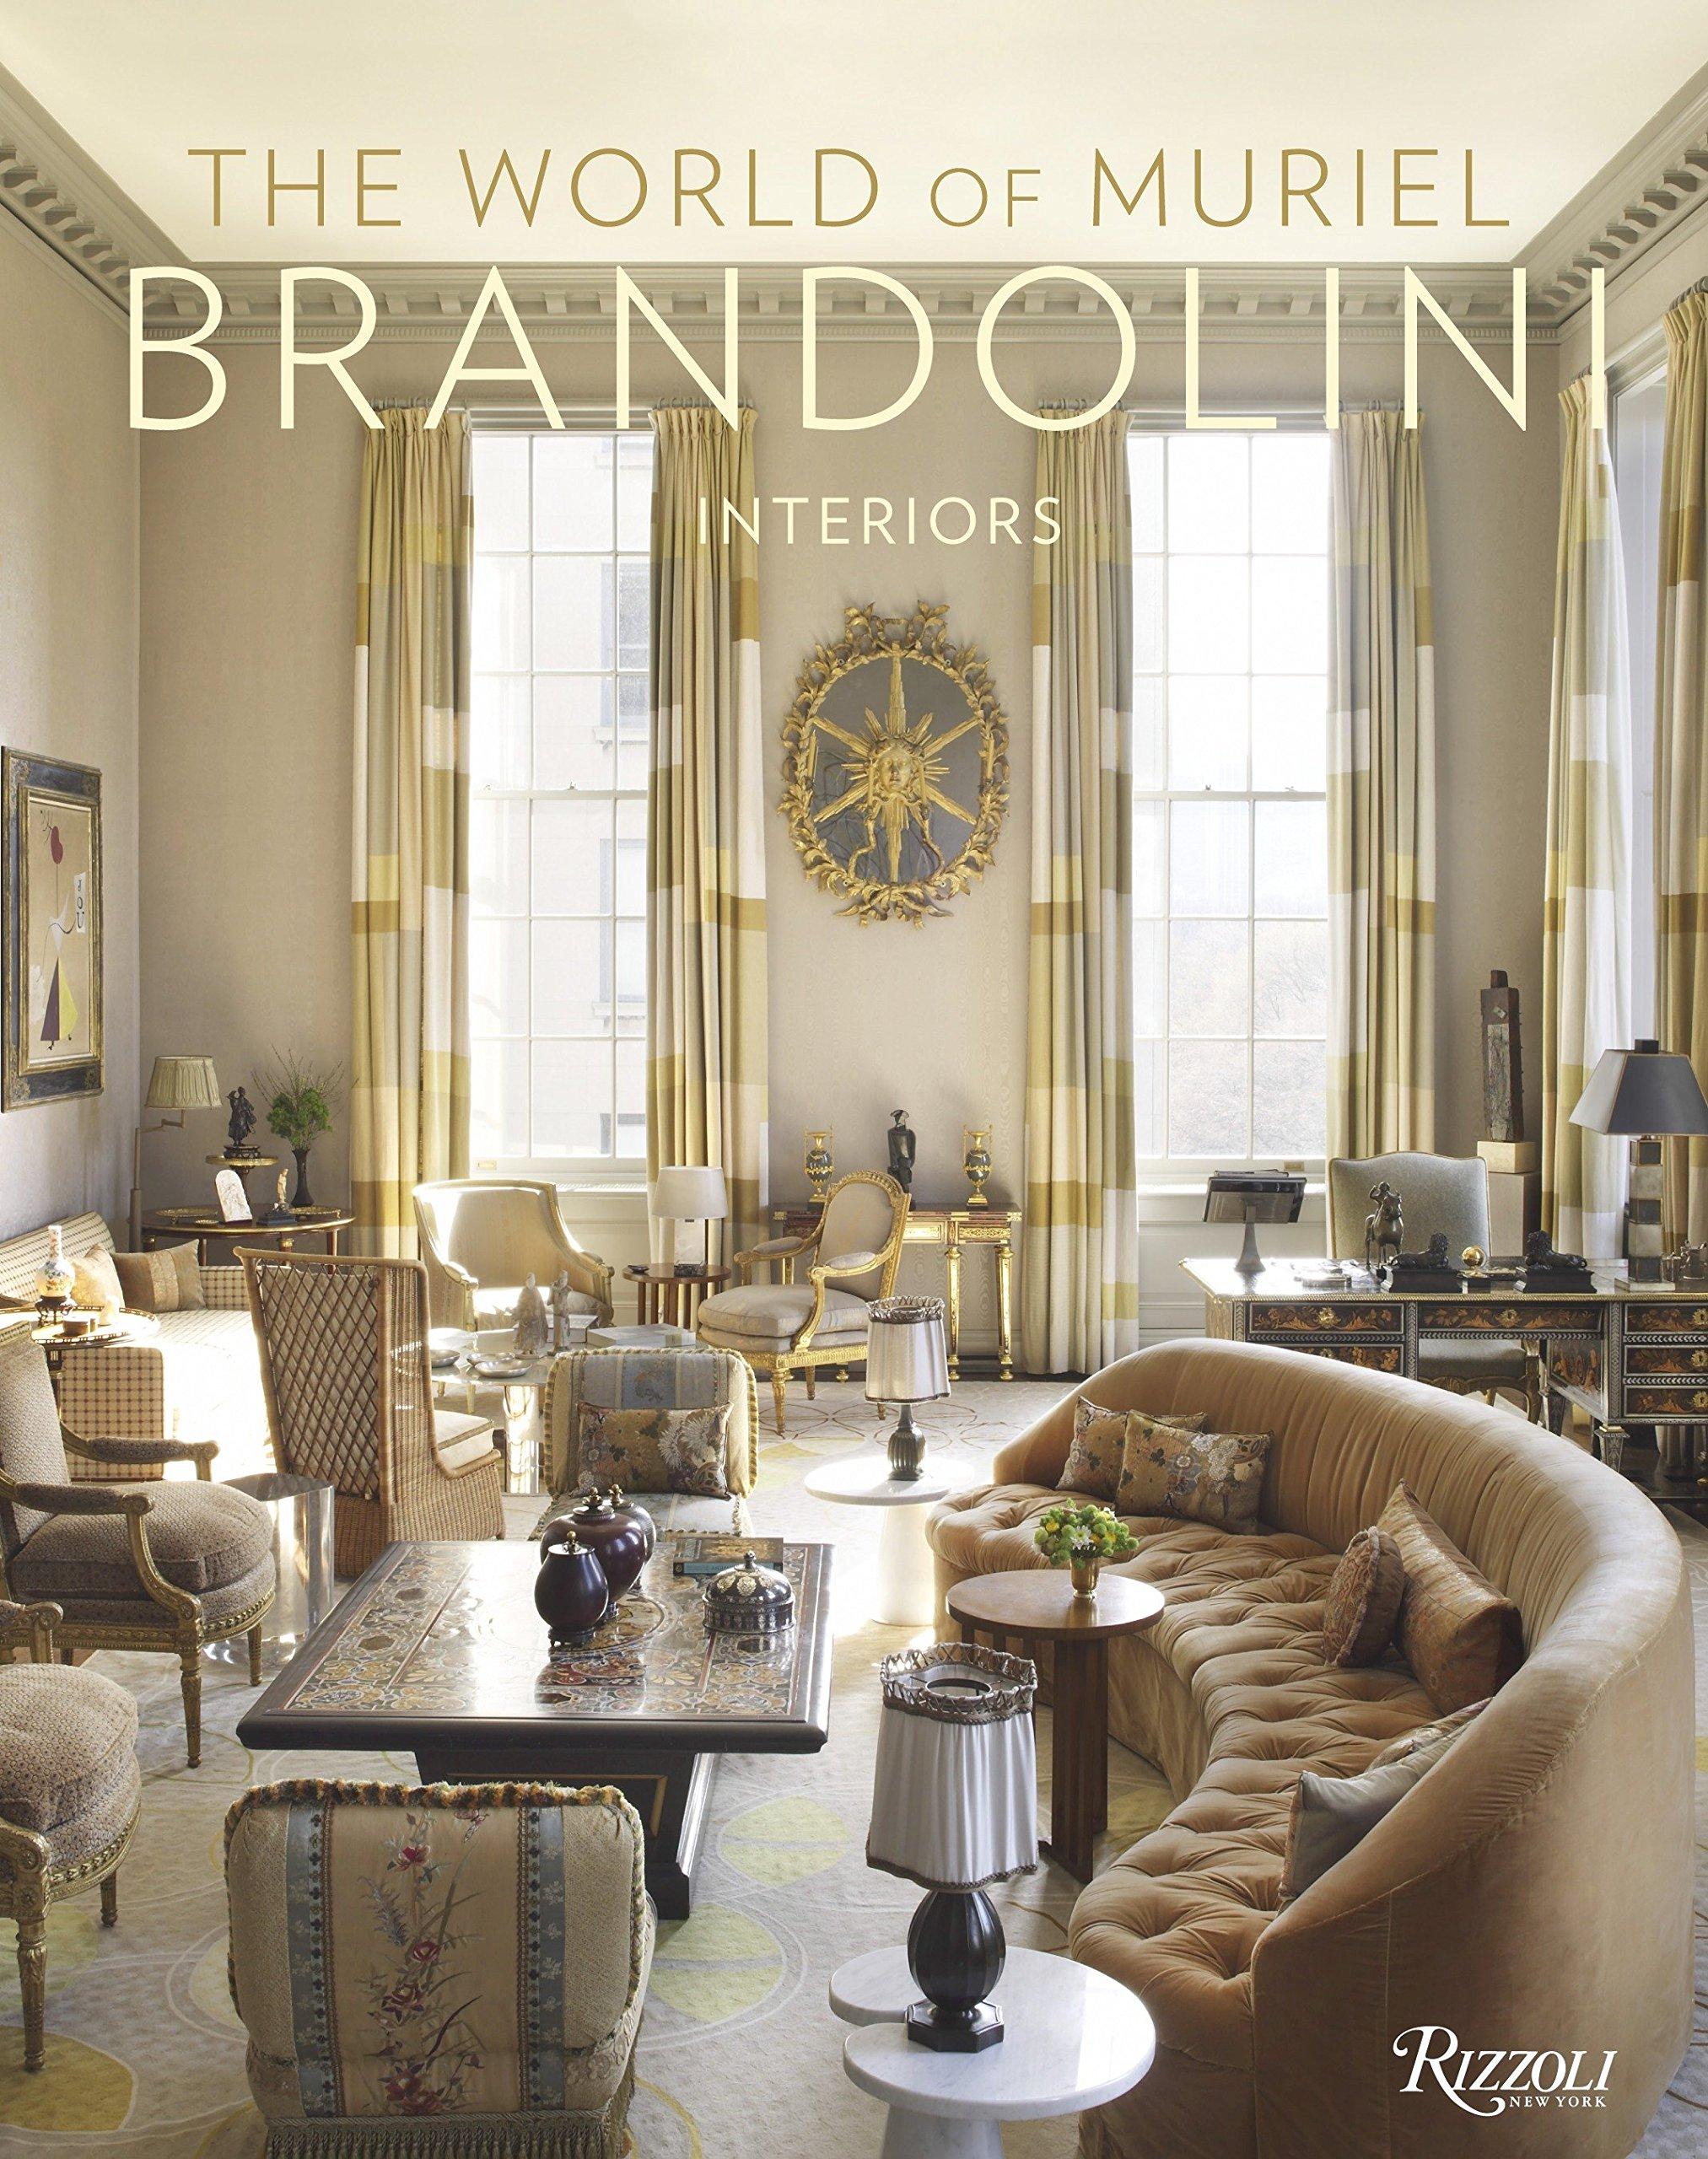 The World of Muriel Brandolini: Interiors ebook